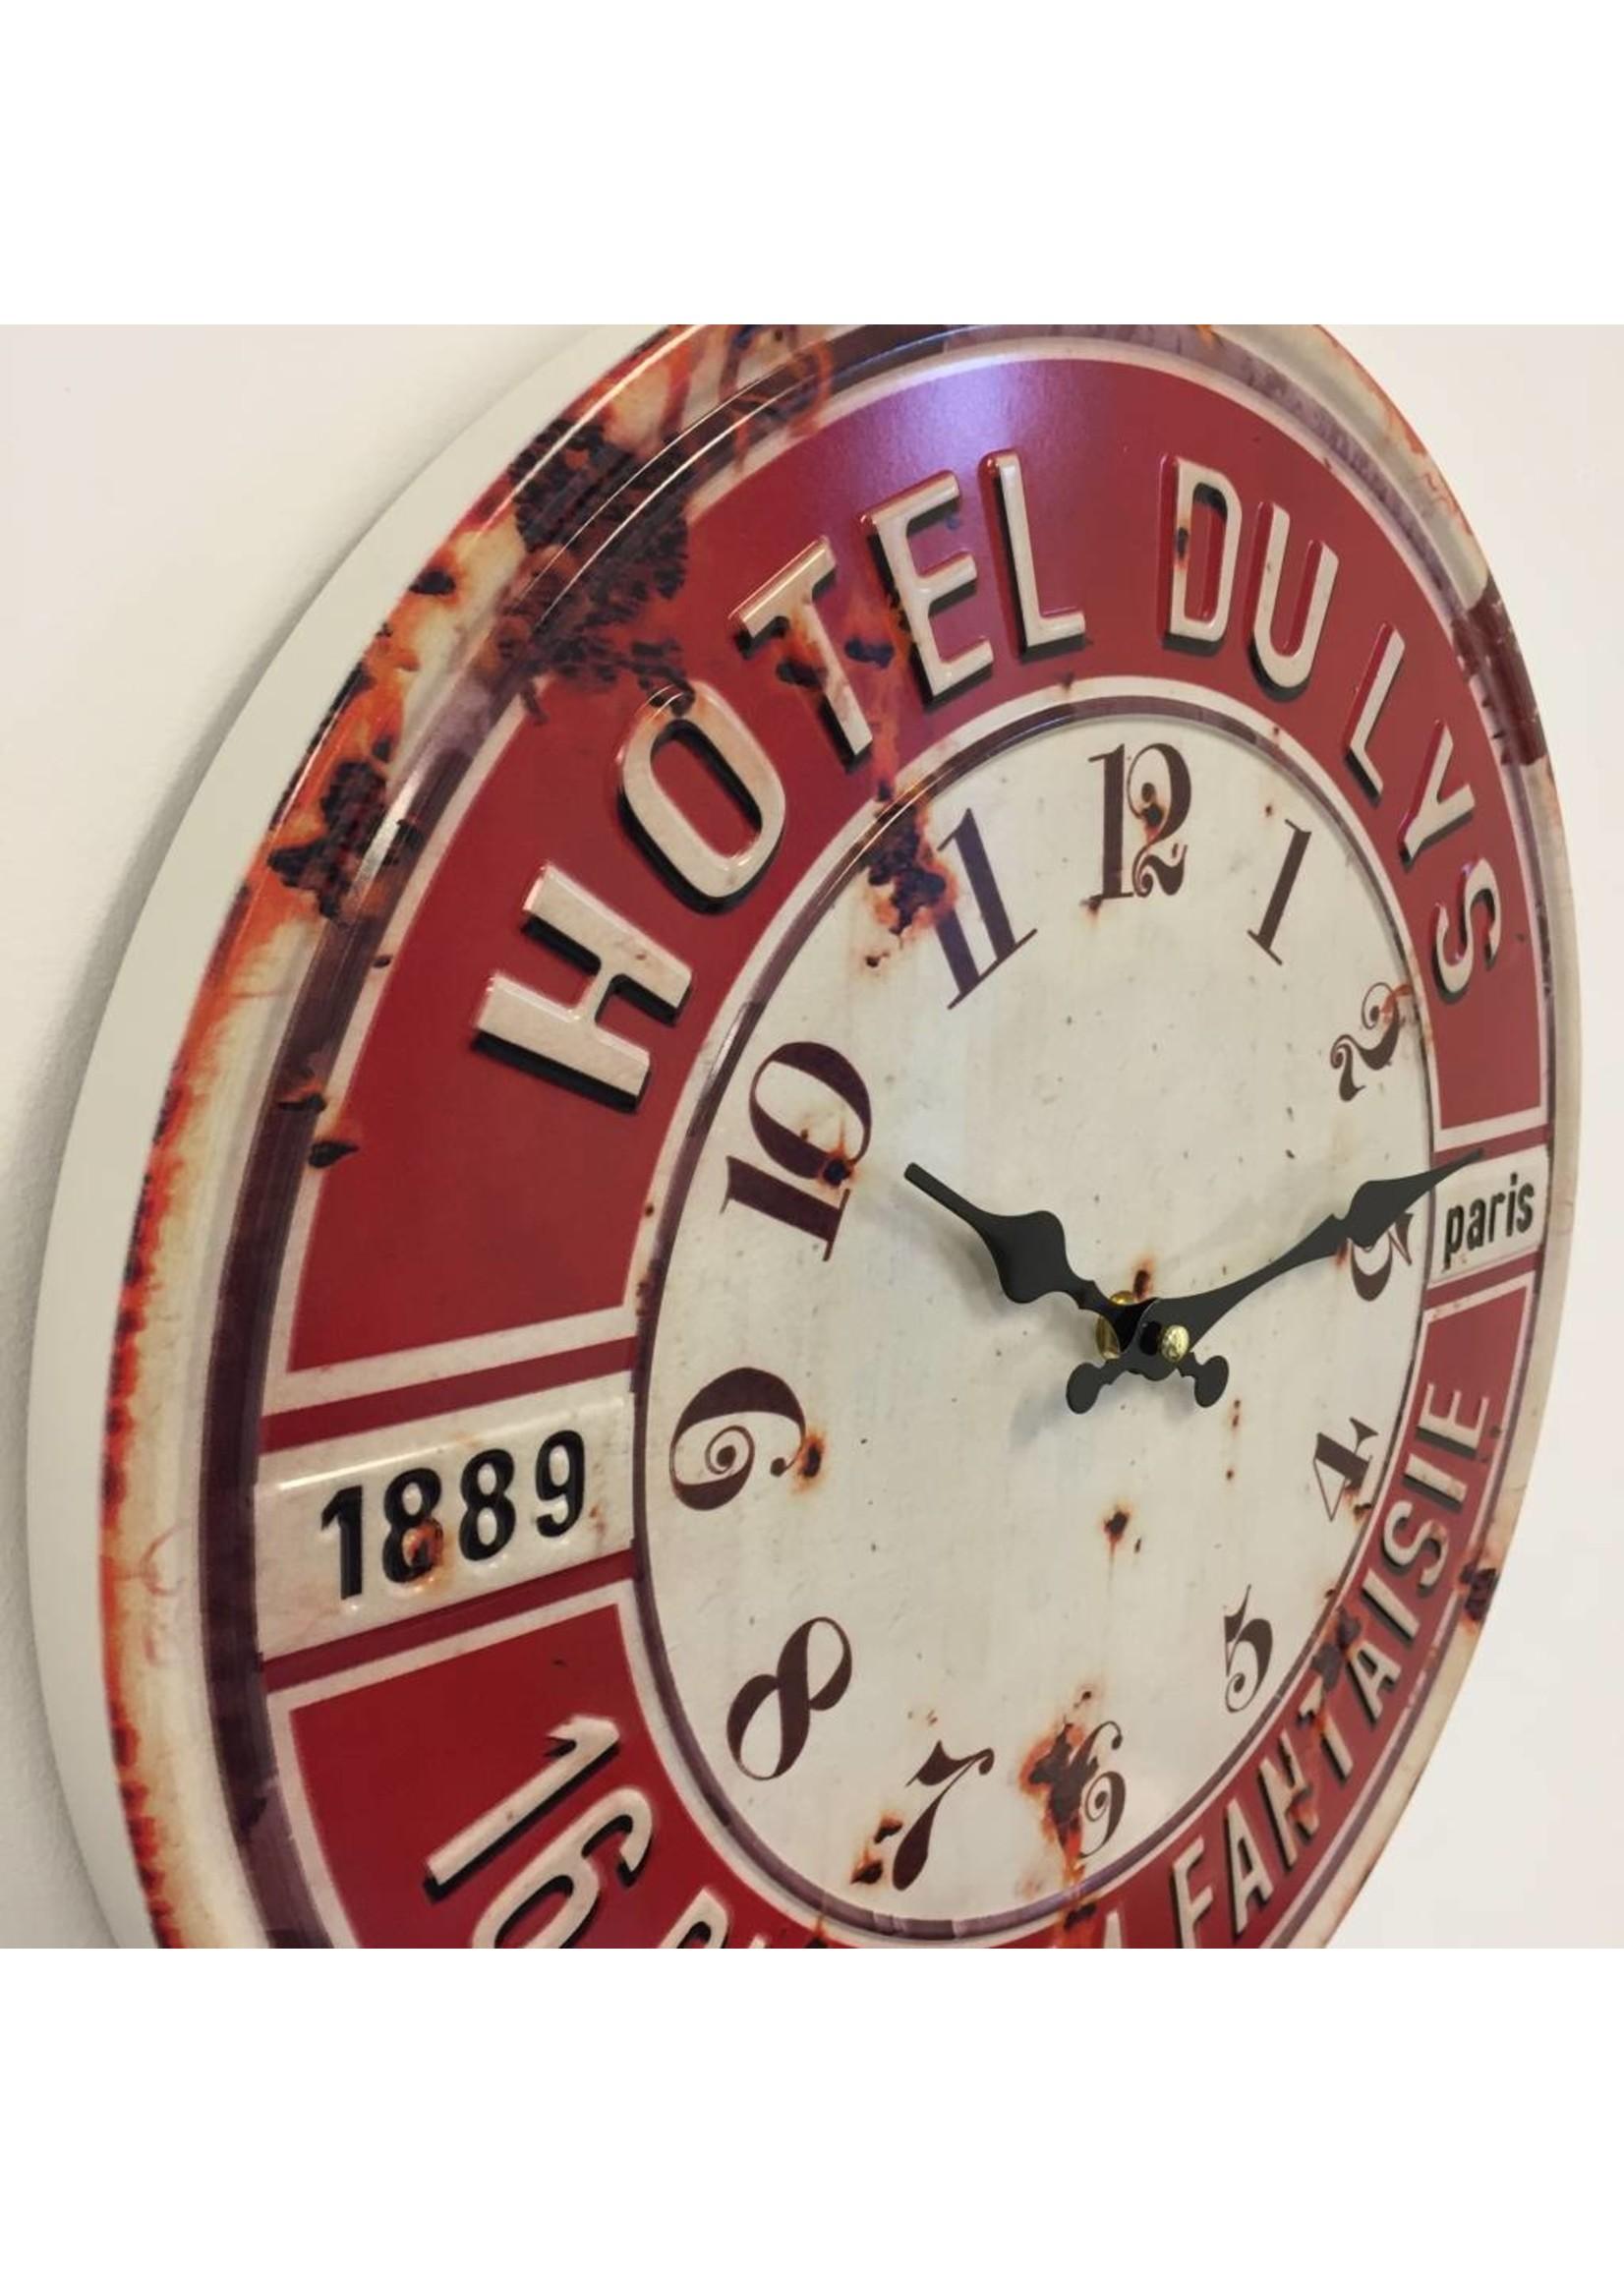 NiceTime Wandklok Paris Hotel du Lys 1889